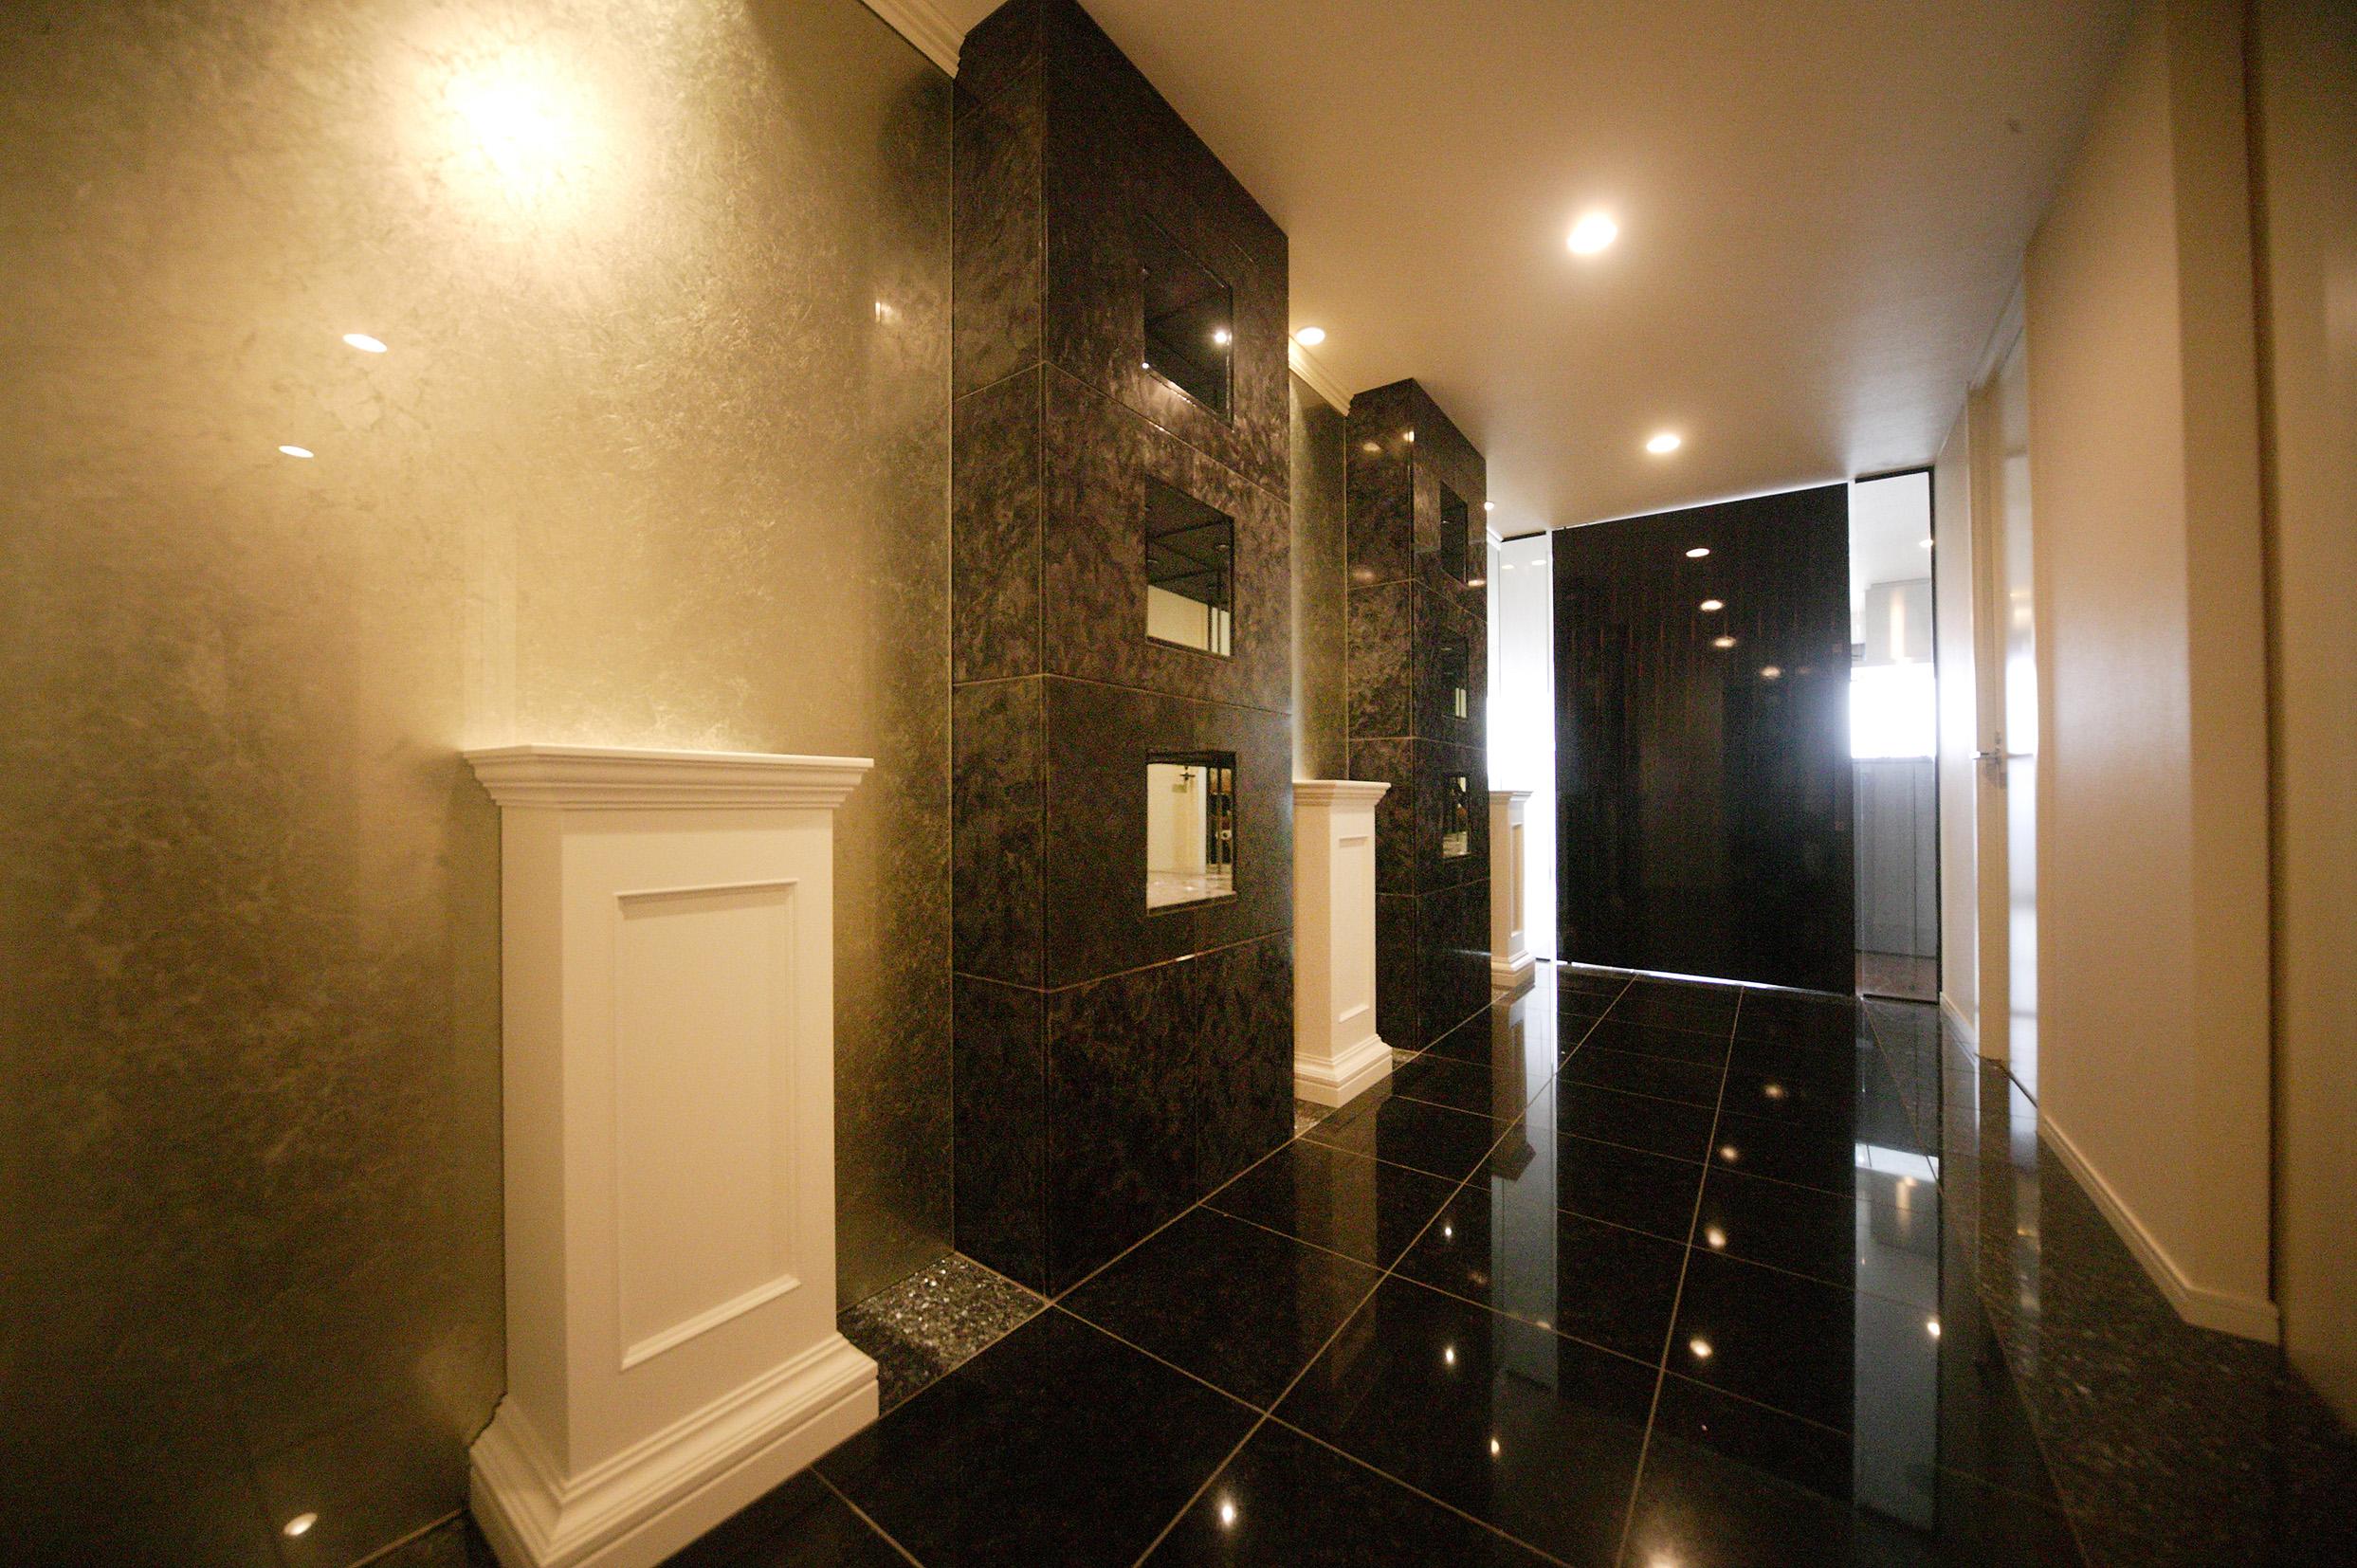 Hallway, Treasure space, Decorative glass, stone